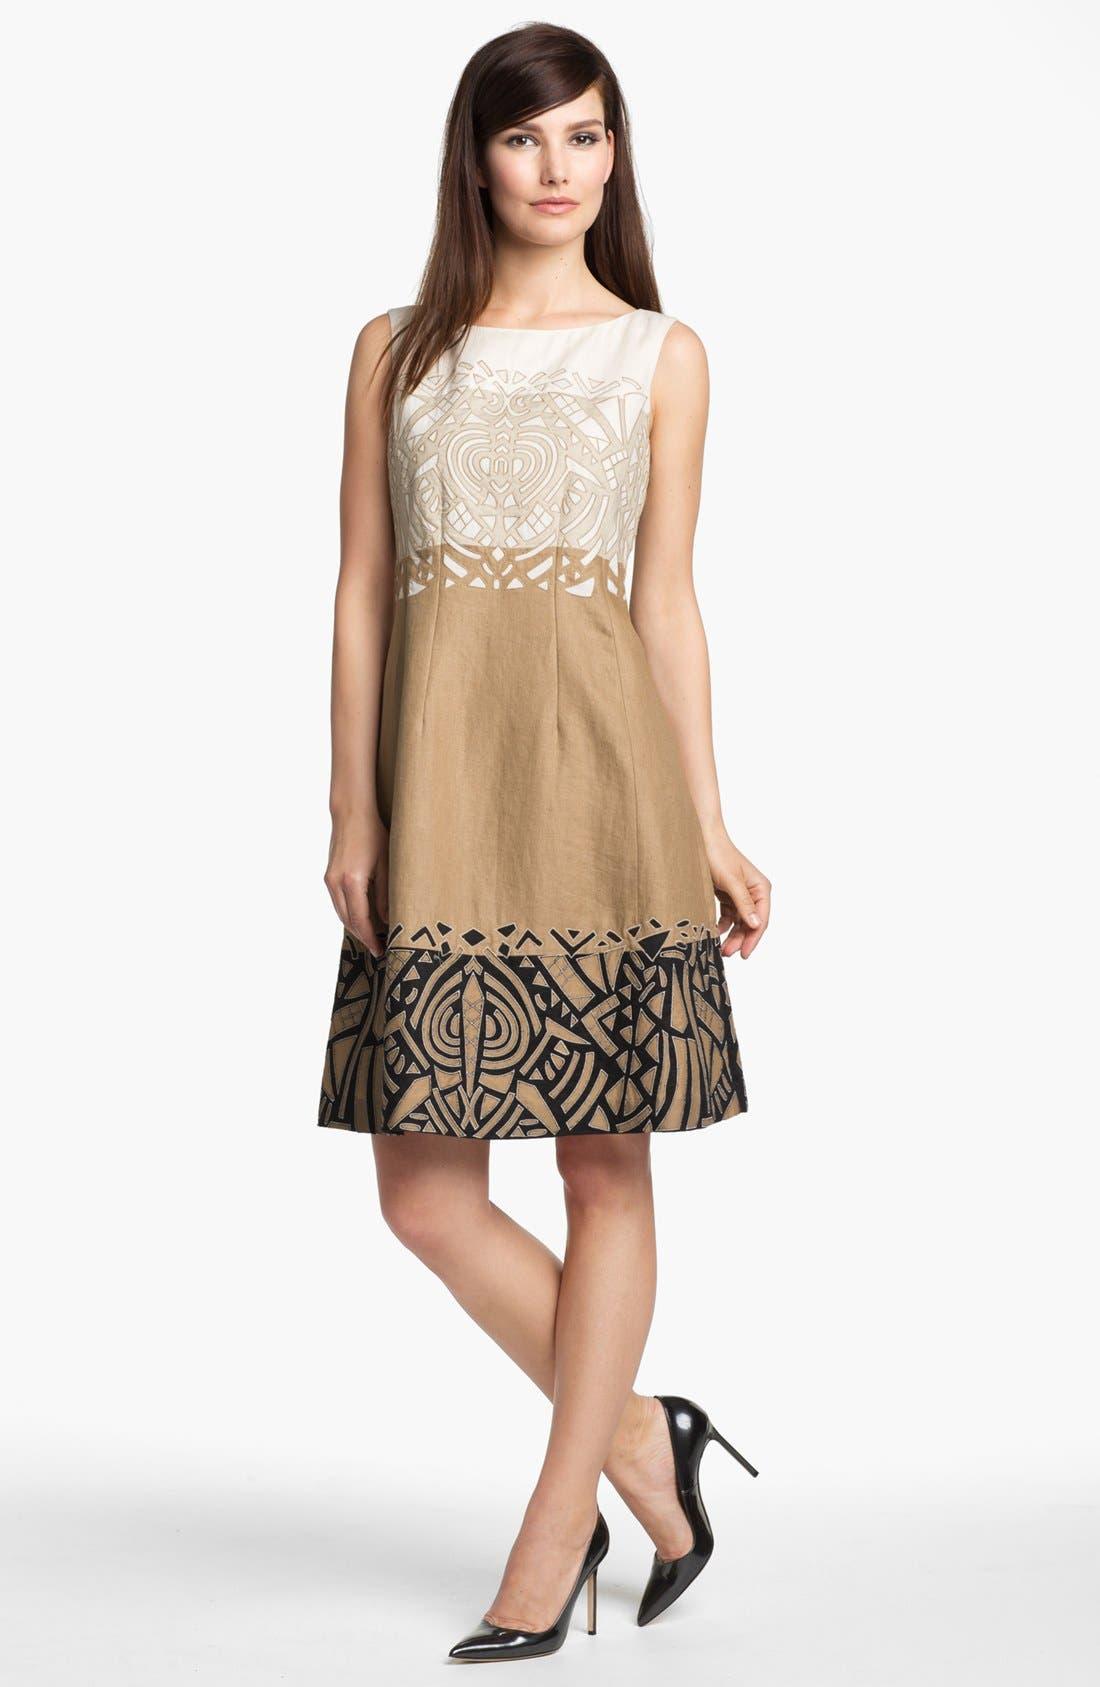 Alternate Image 1 Selected - Lafayette 148 New York 'Lavish Linen' Embellished Dress